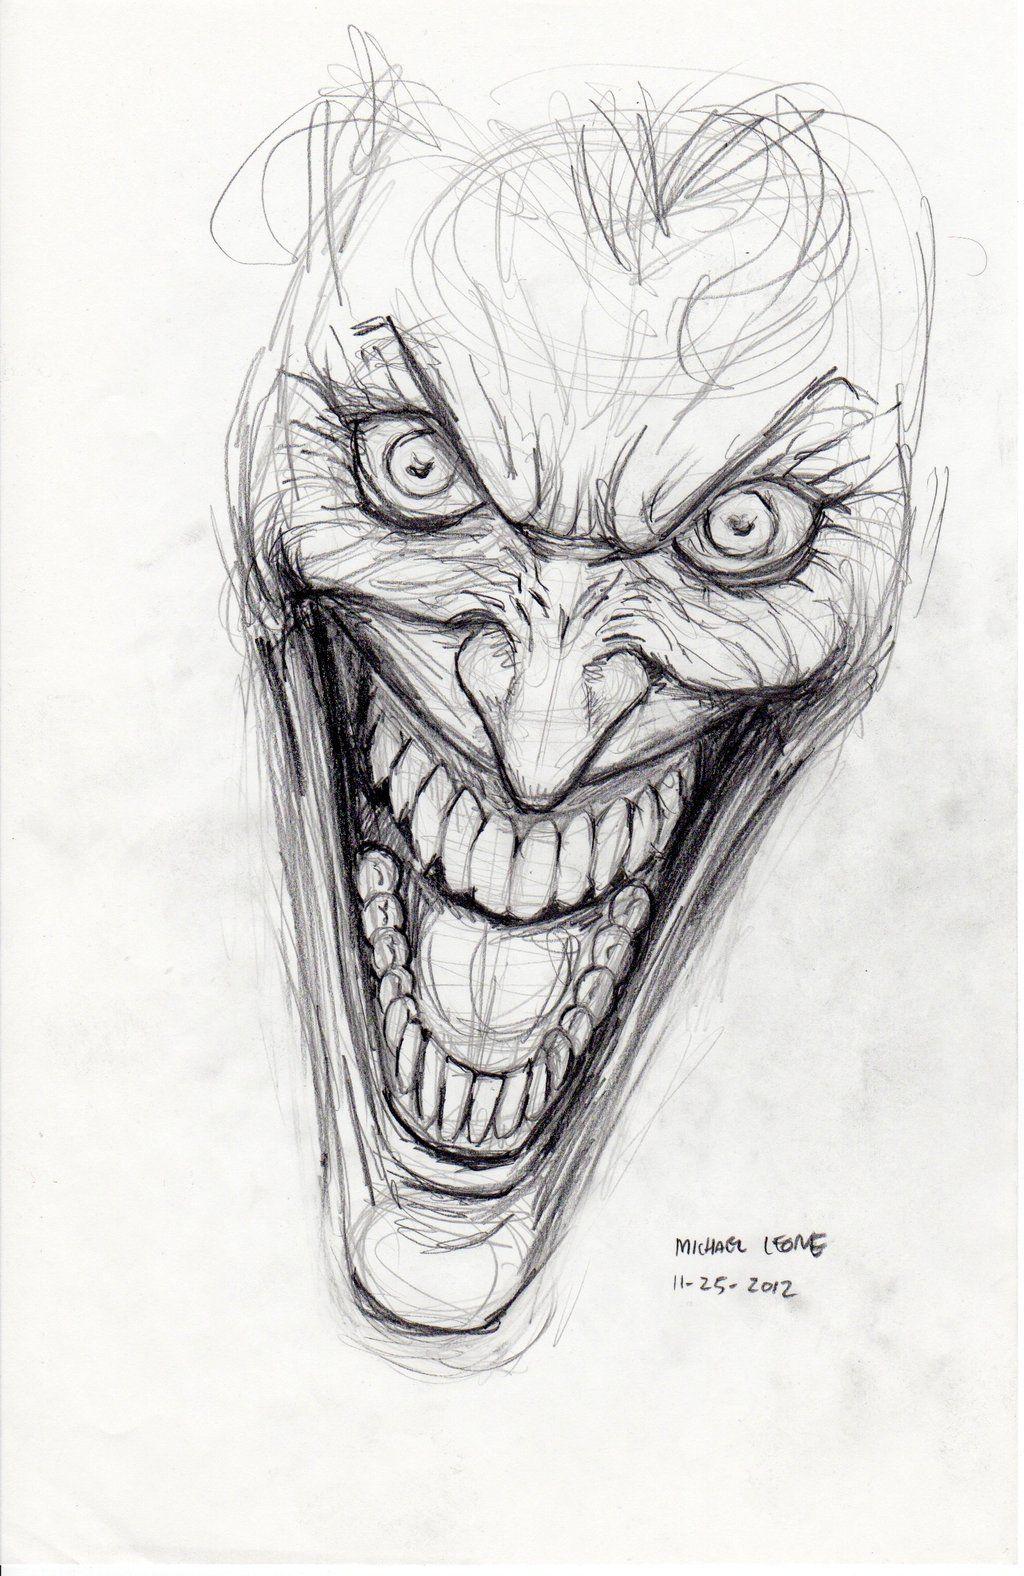 Drawing Joker Cartoon : drawing, joker, cartoon, Tattoo, Ideas, BeatTattoo.com, Joker, Sketch,, Drawings,, Drawings